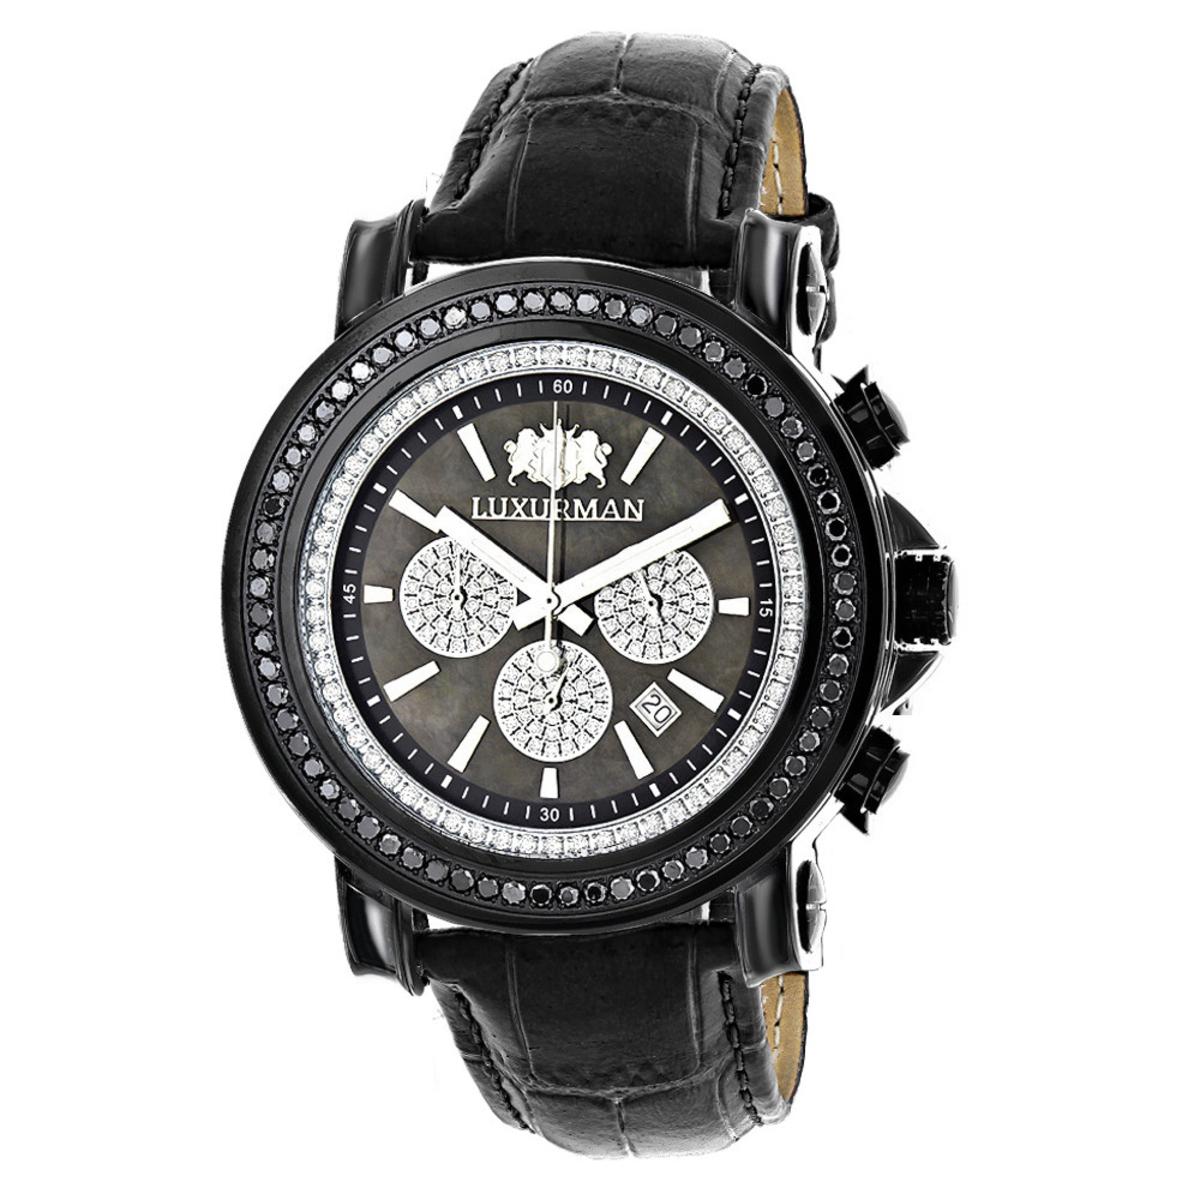 3ct Large Mens Black Diamond Watch MOP Dial w Chronograph Luxurman Escalade